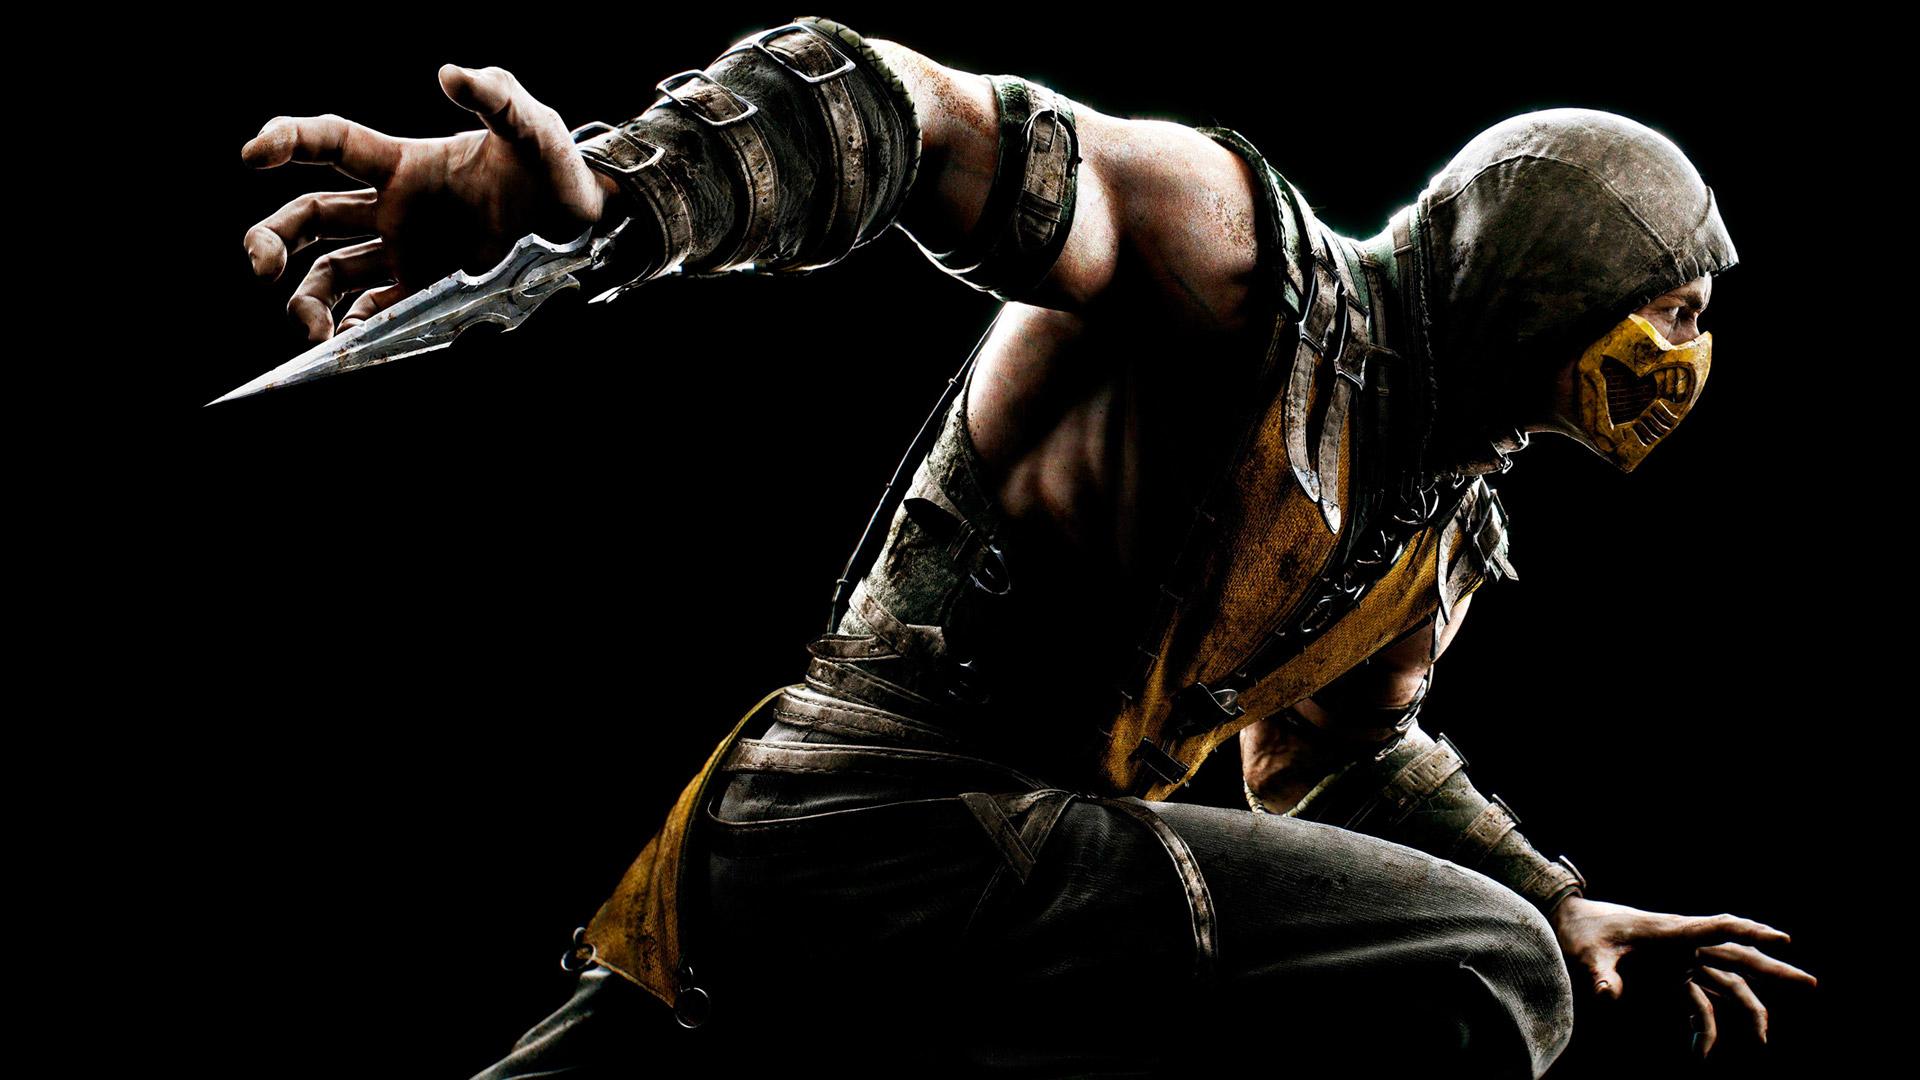 45 Mortal Kombat X Wallpaper 1080p On Wallpapersafari